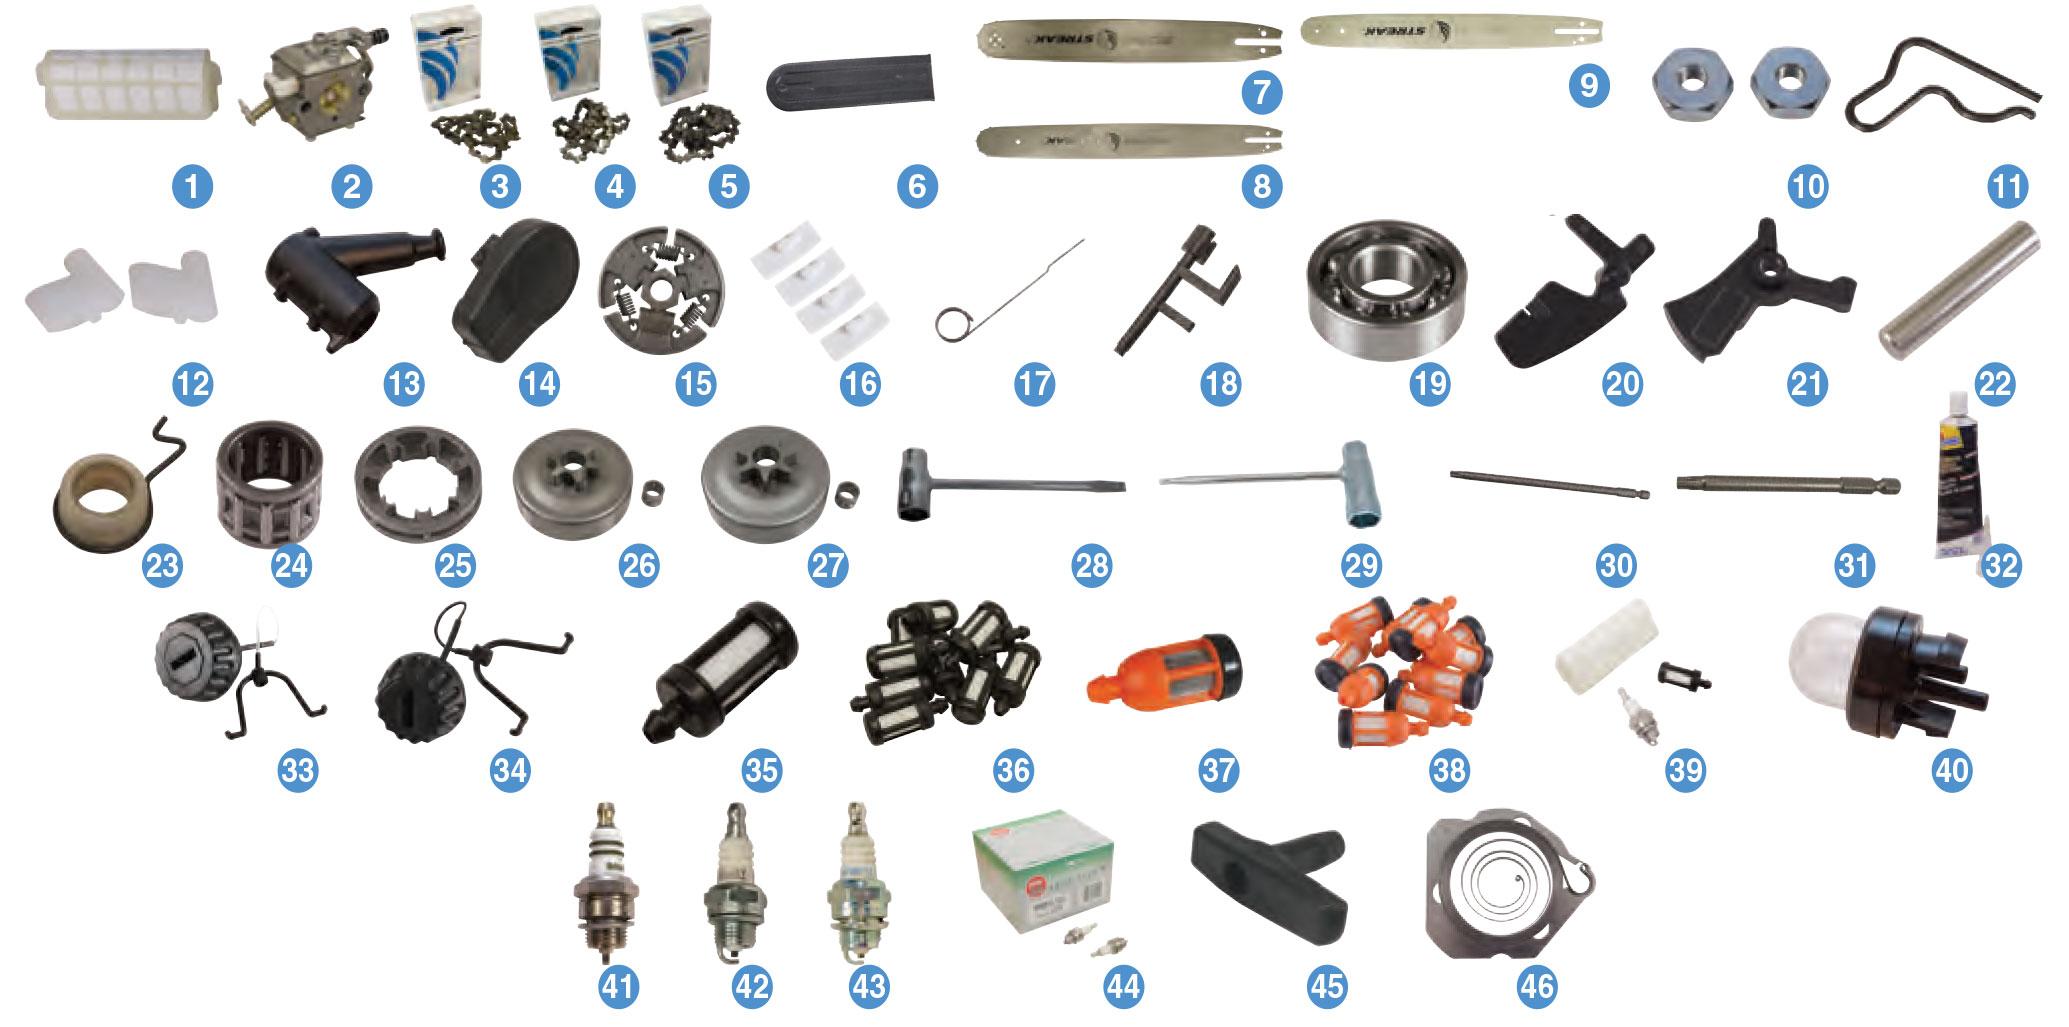 stihl ms250 chainsaw parts diagram holley 4 barrel carburetor 250 list model related keywords